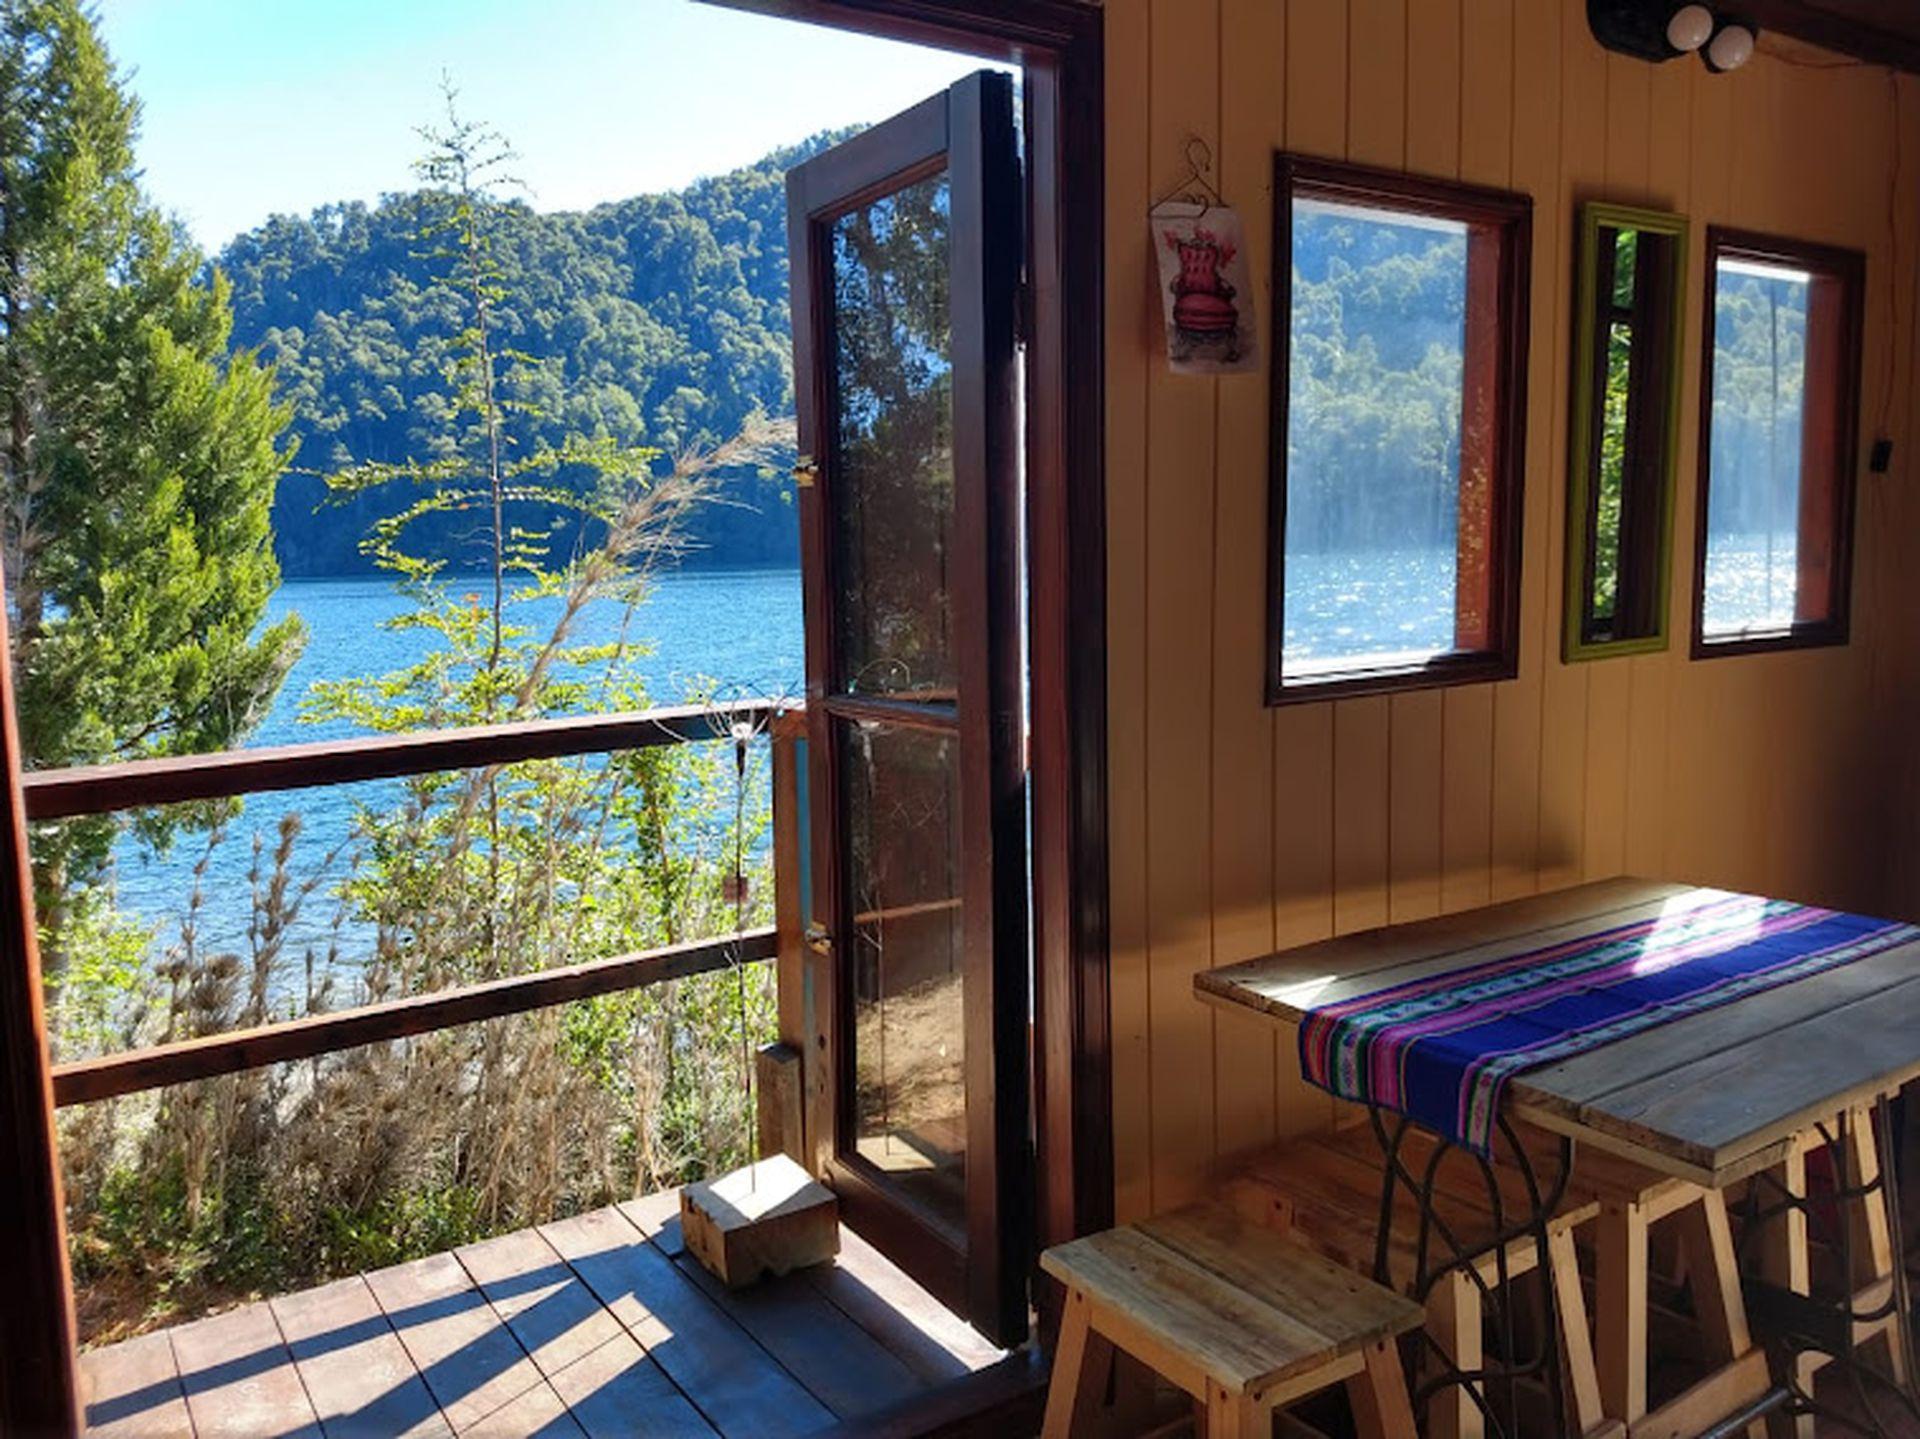 Vista privilegiada al lago Correntoso.